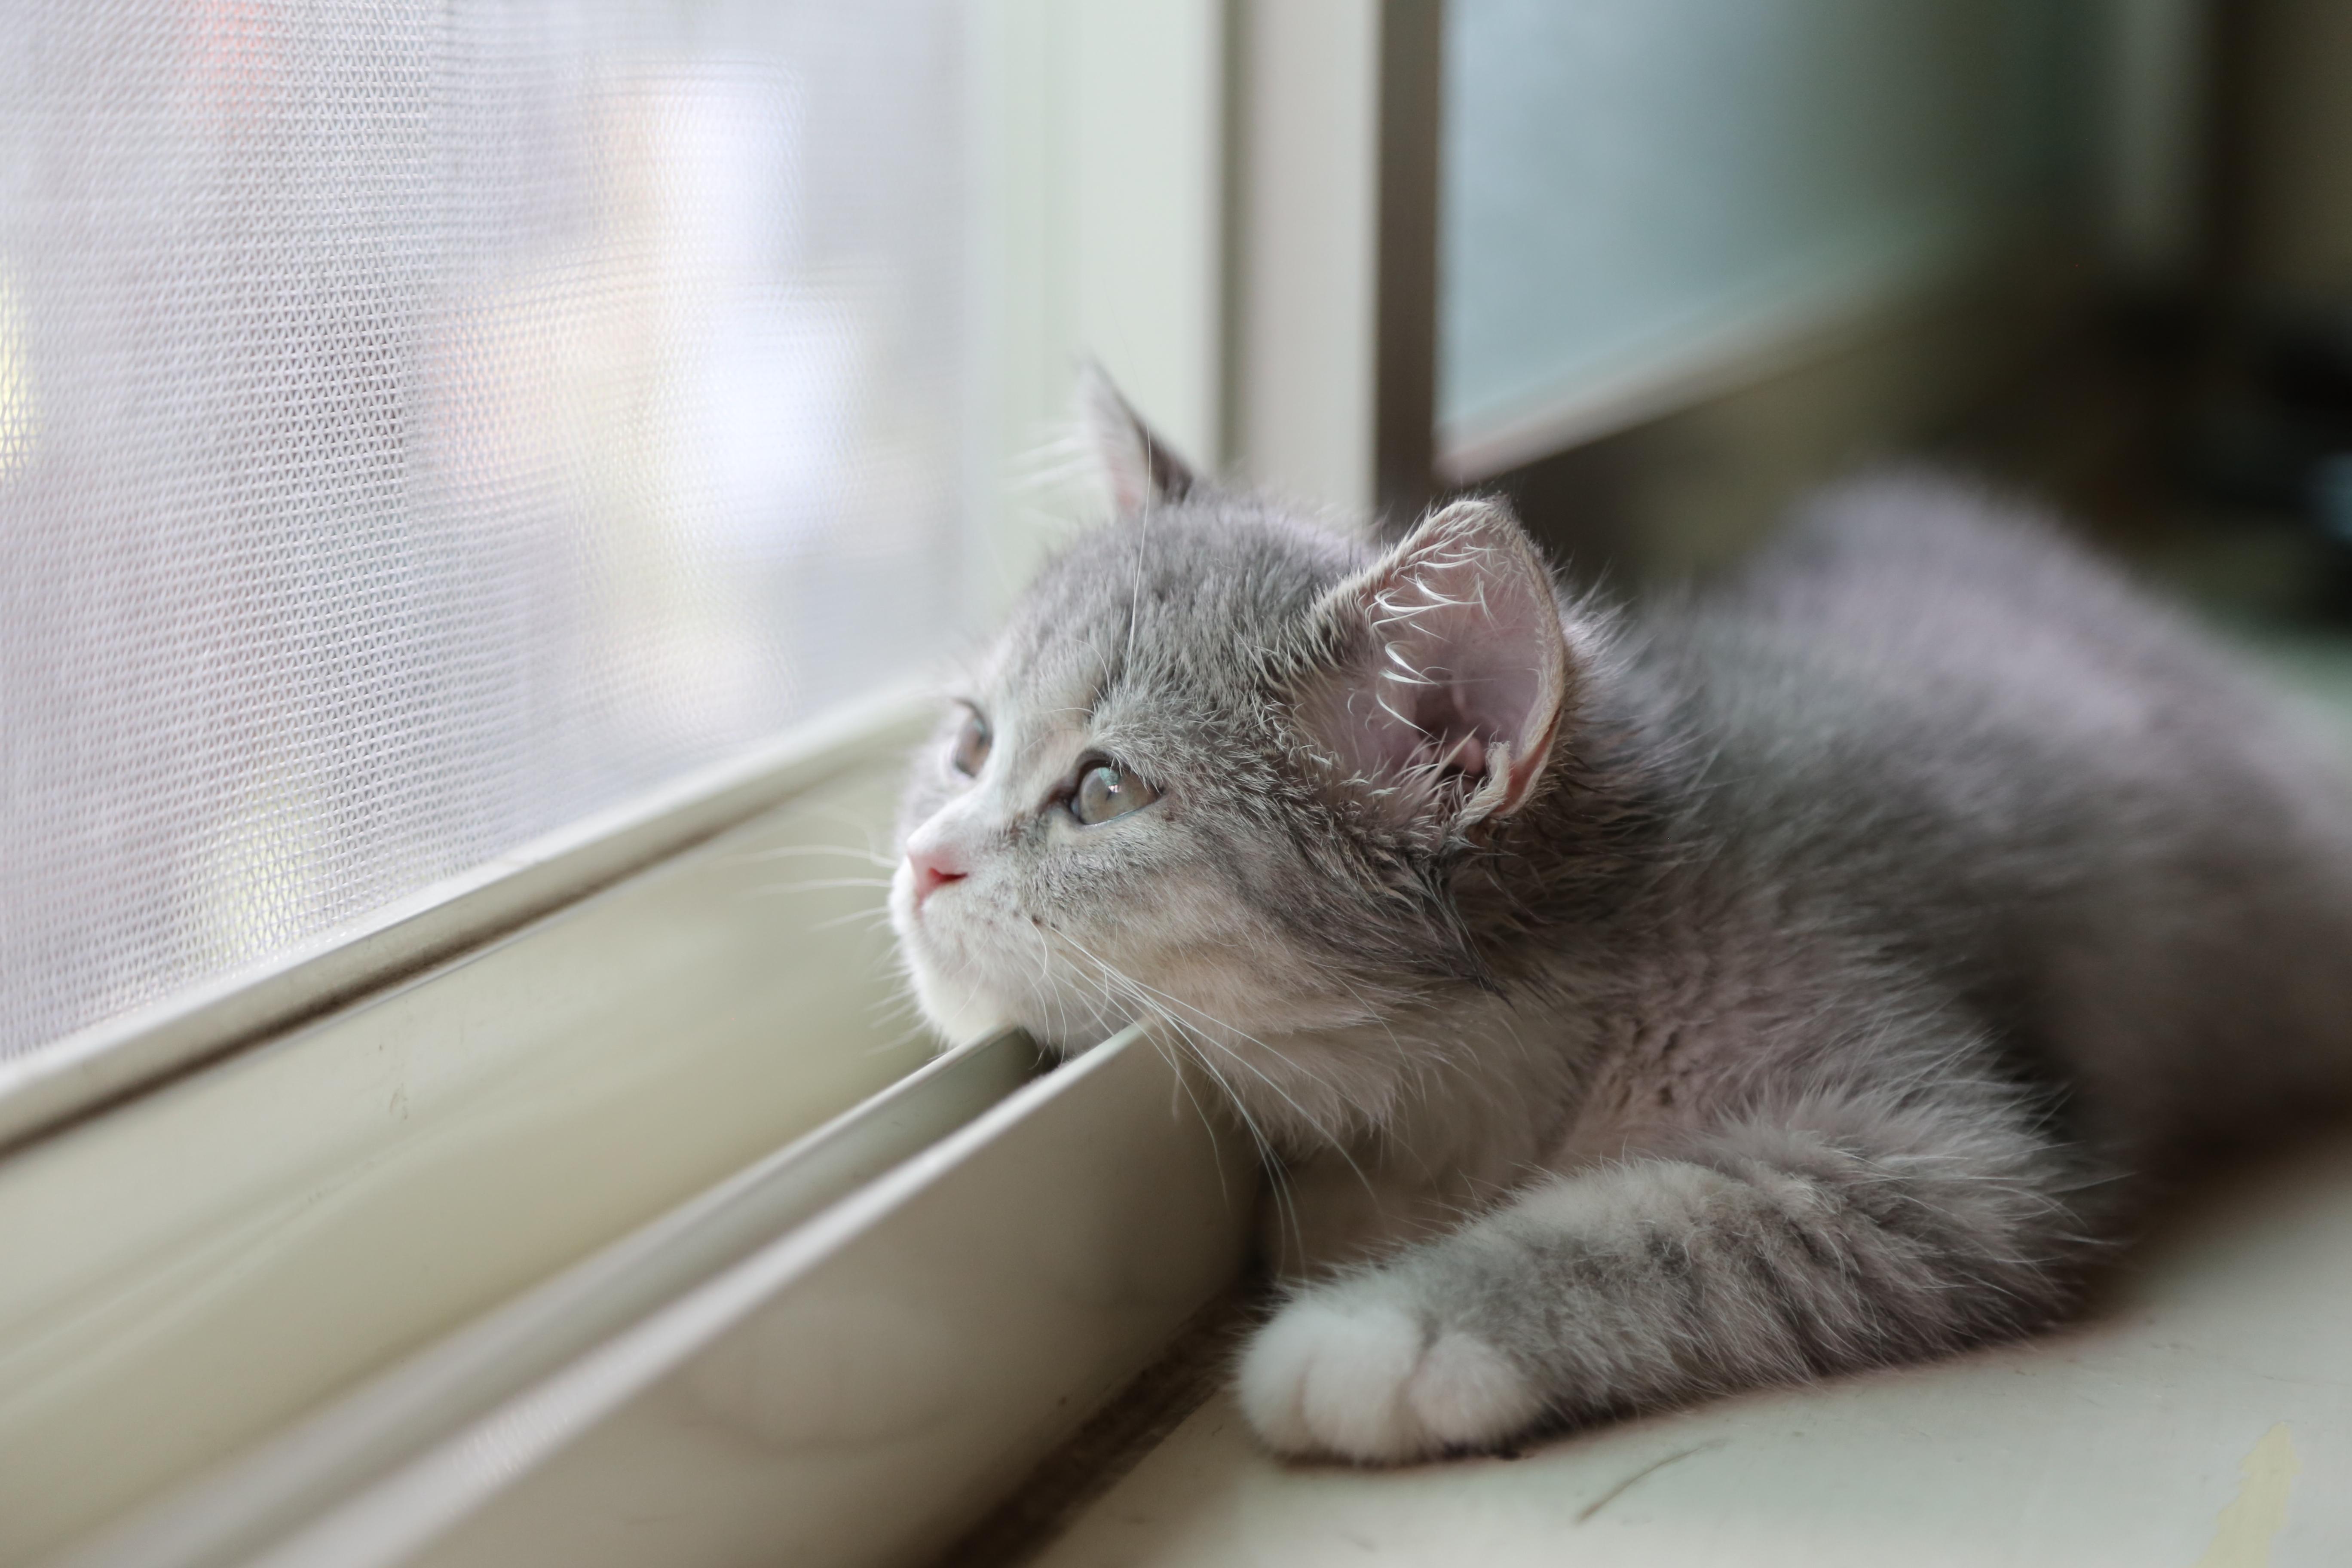 котята на окне kittens on the window  № 3063190 бесплатно